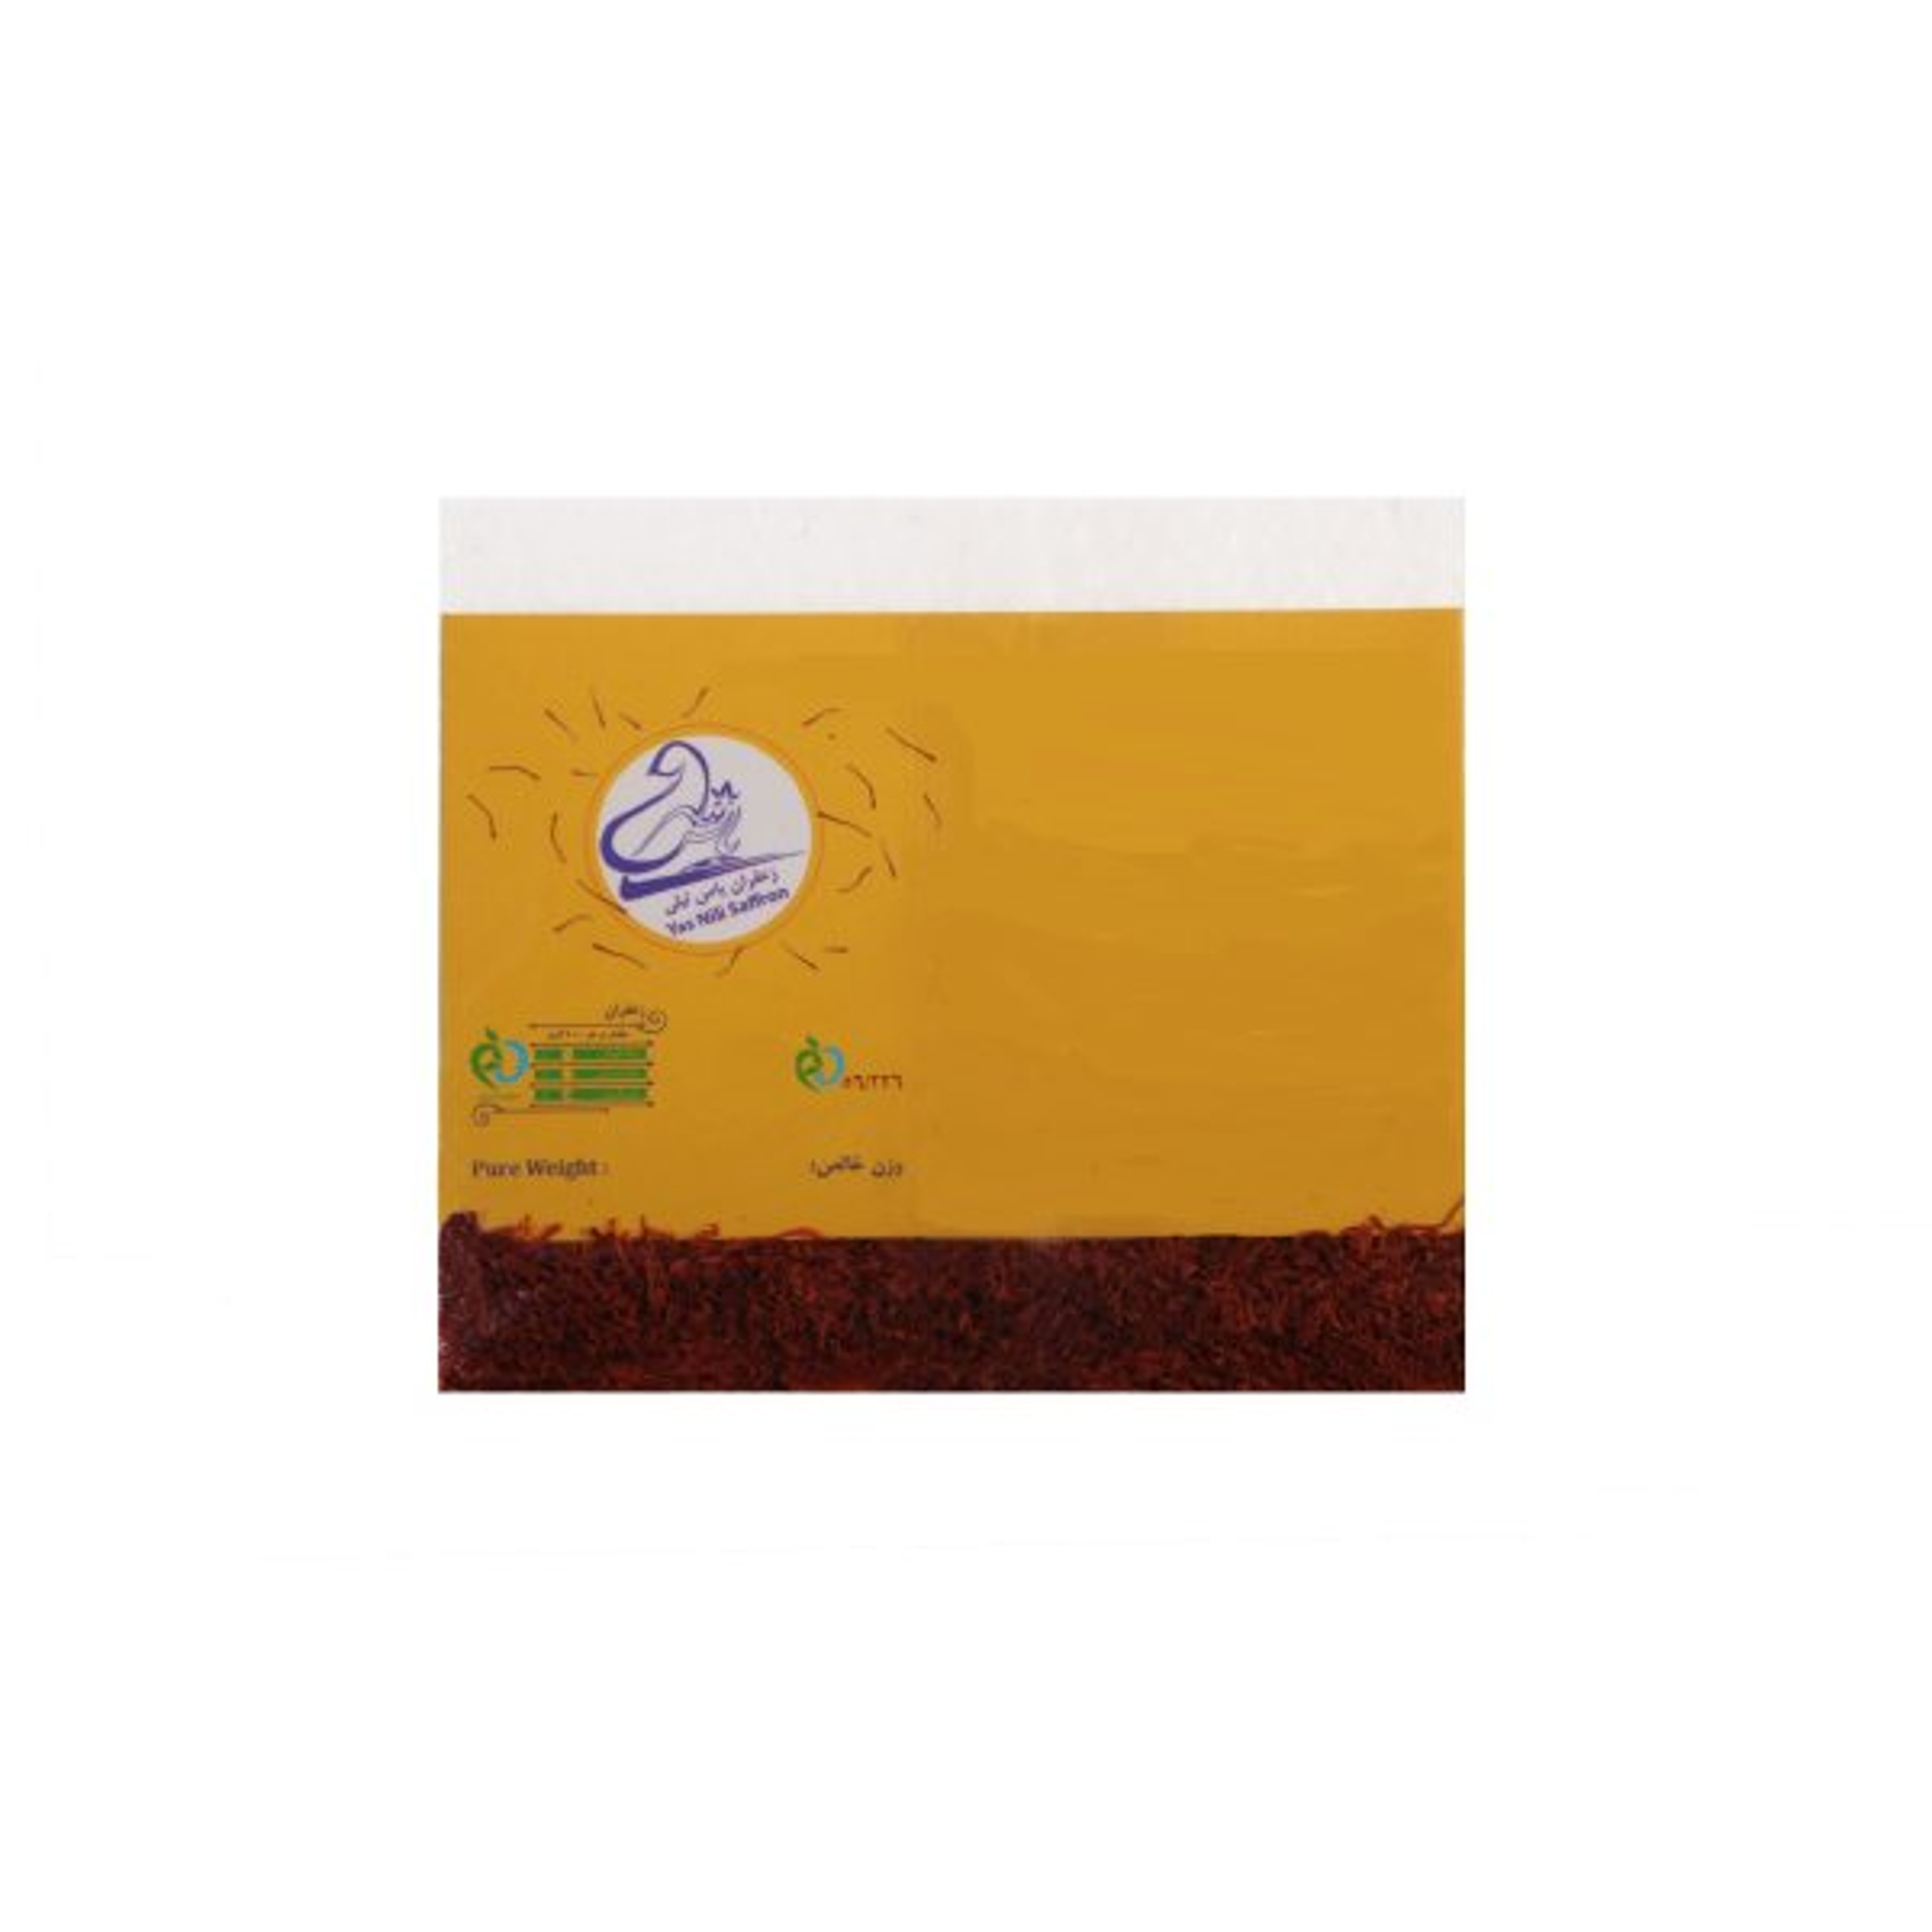 زعفران سرگل یاس نیلی - 1 گرم